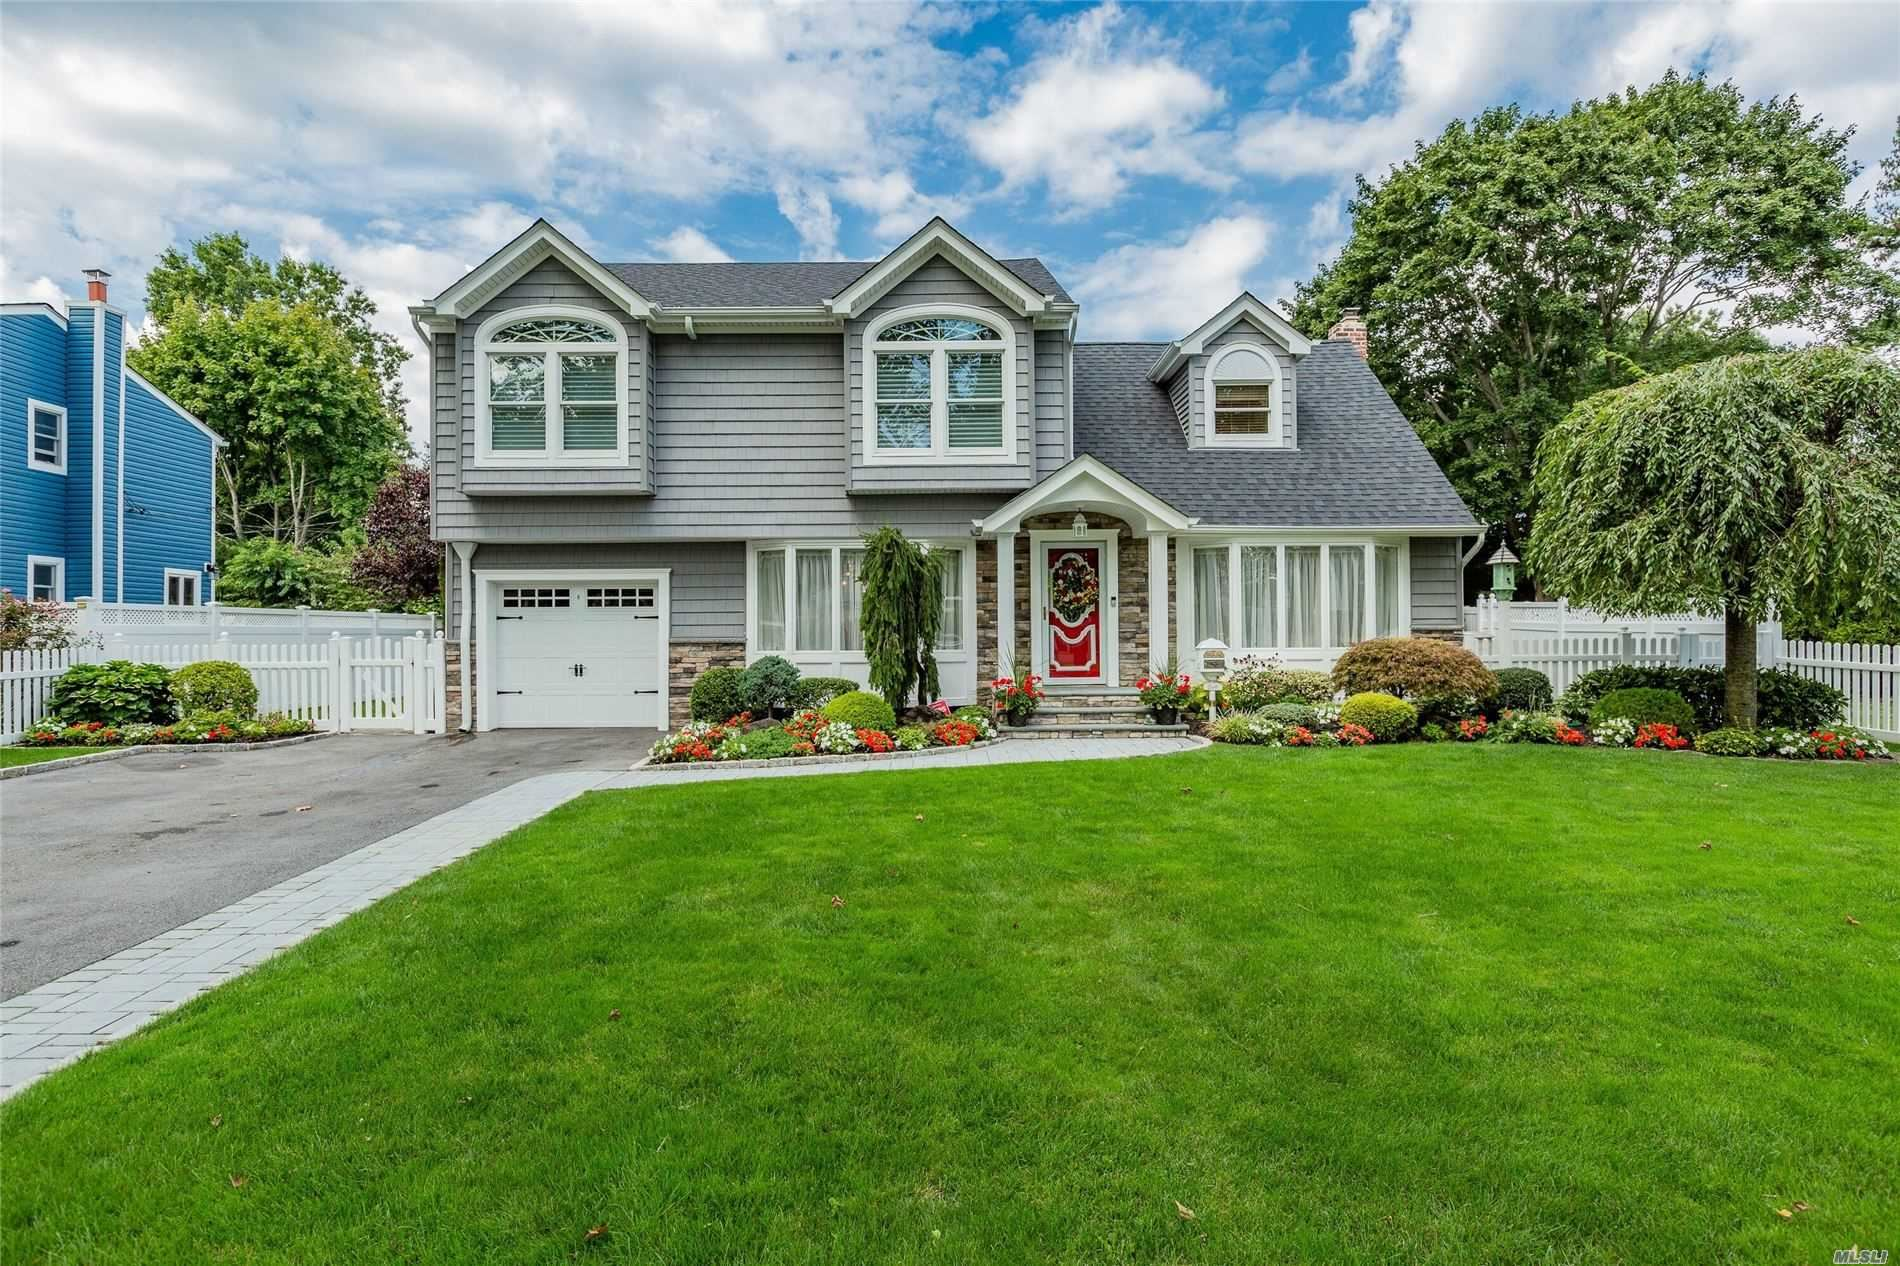 8 Grendon Lane, Commack, NY 11725 - MLS#: 3207517